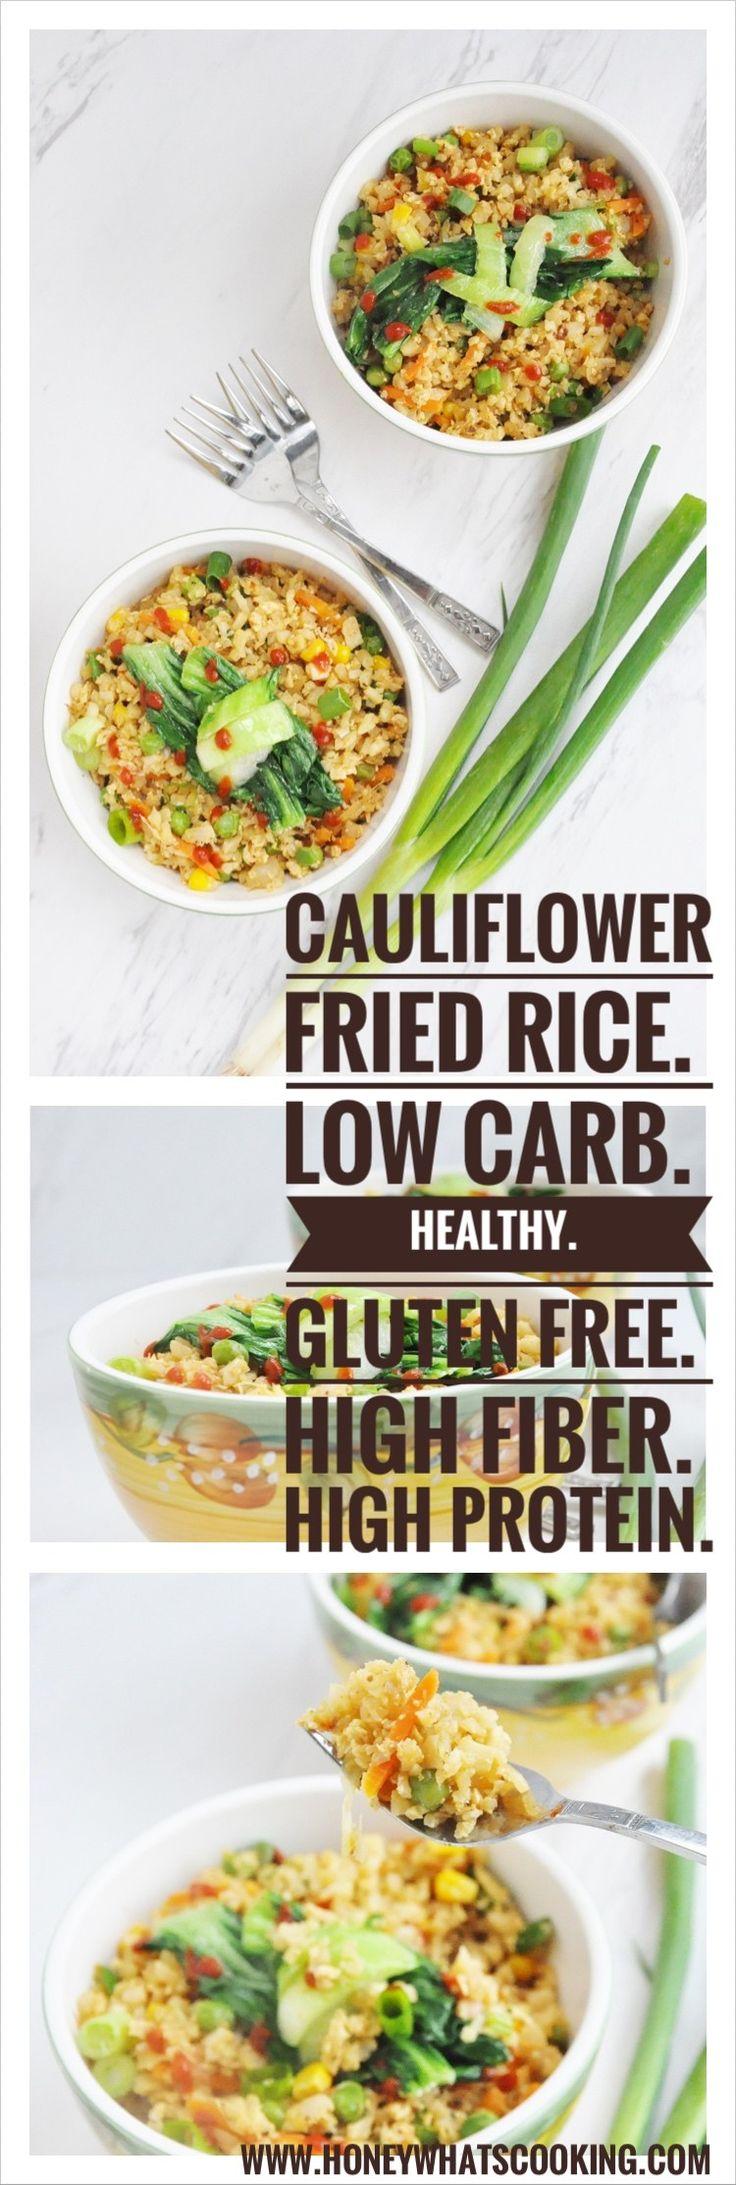 Cauliflower Fried Rice (low carb, high protein, gluten free, healthy, high fiber...